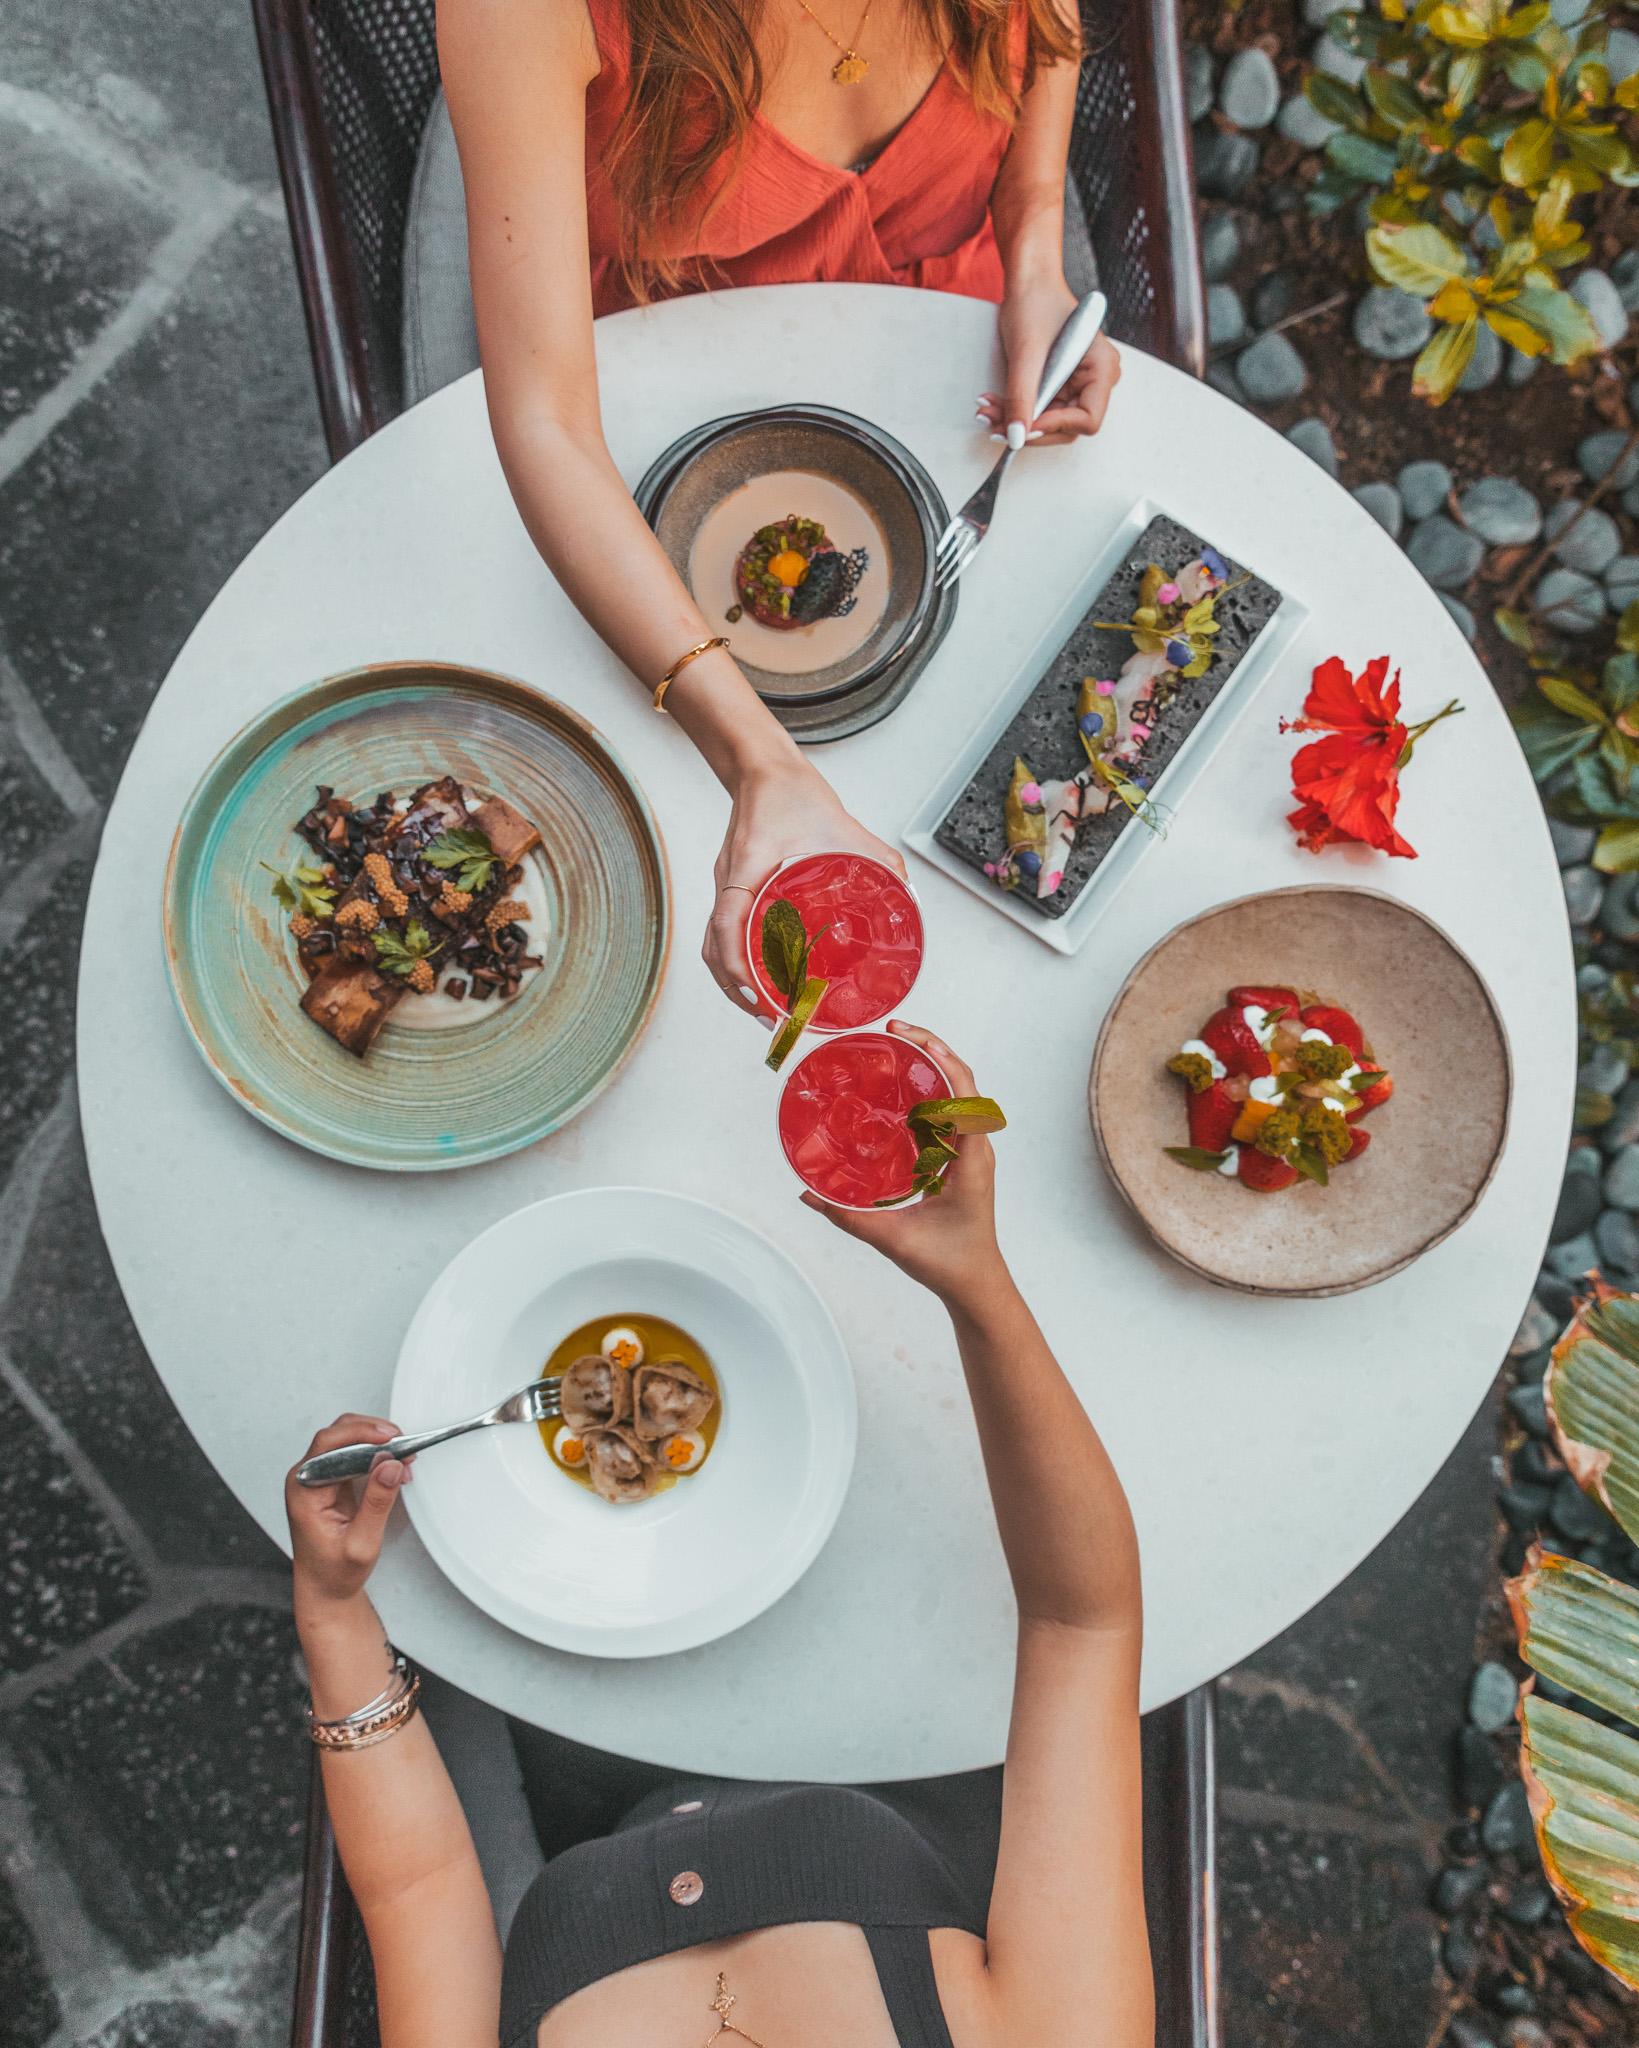 Dinner at Ulu Ocean Grill // A Luxury Stay on the Big Island: Four Seasons Resort Hualalai // #readysetjetset #hawaii #bigisland #luxuryhotels #beachresorts #usa #travel